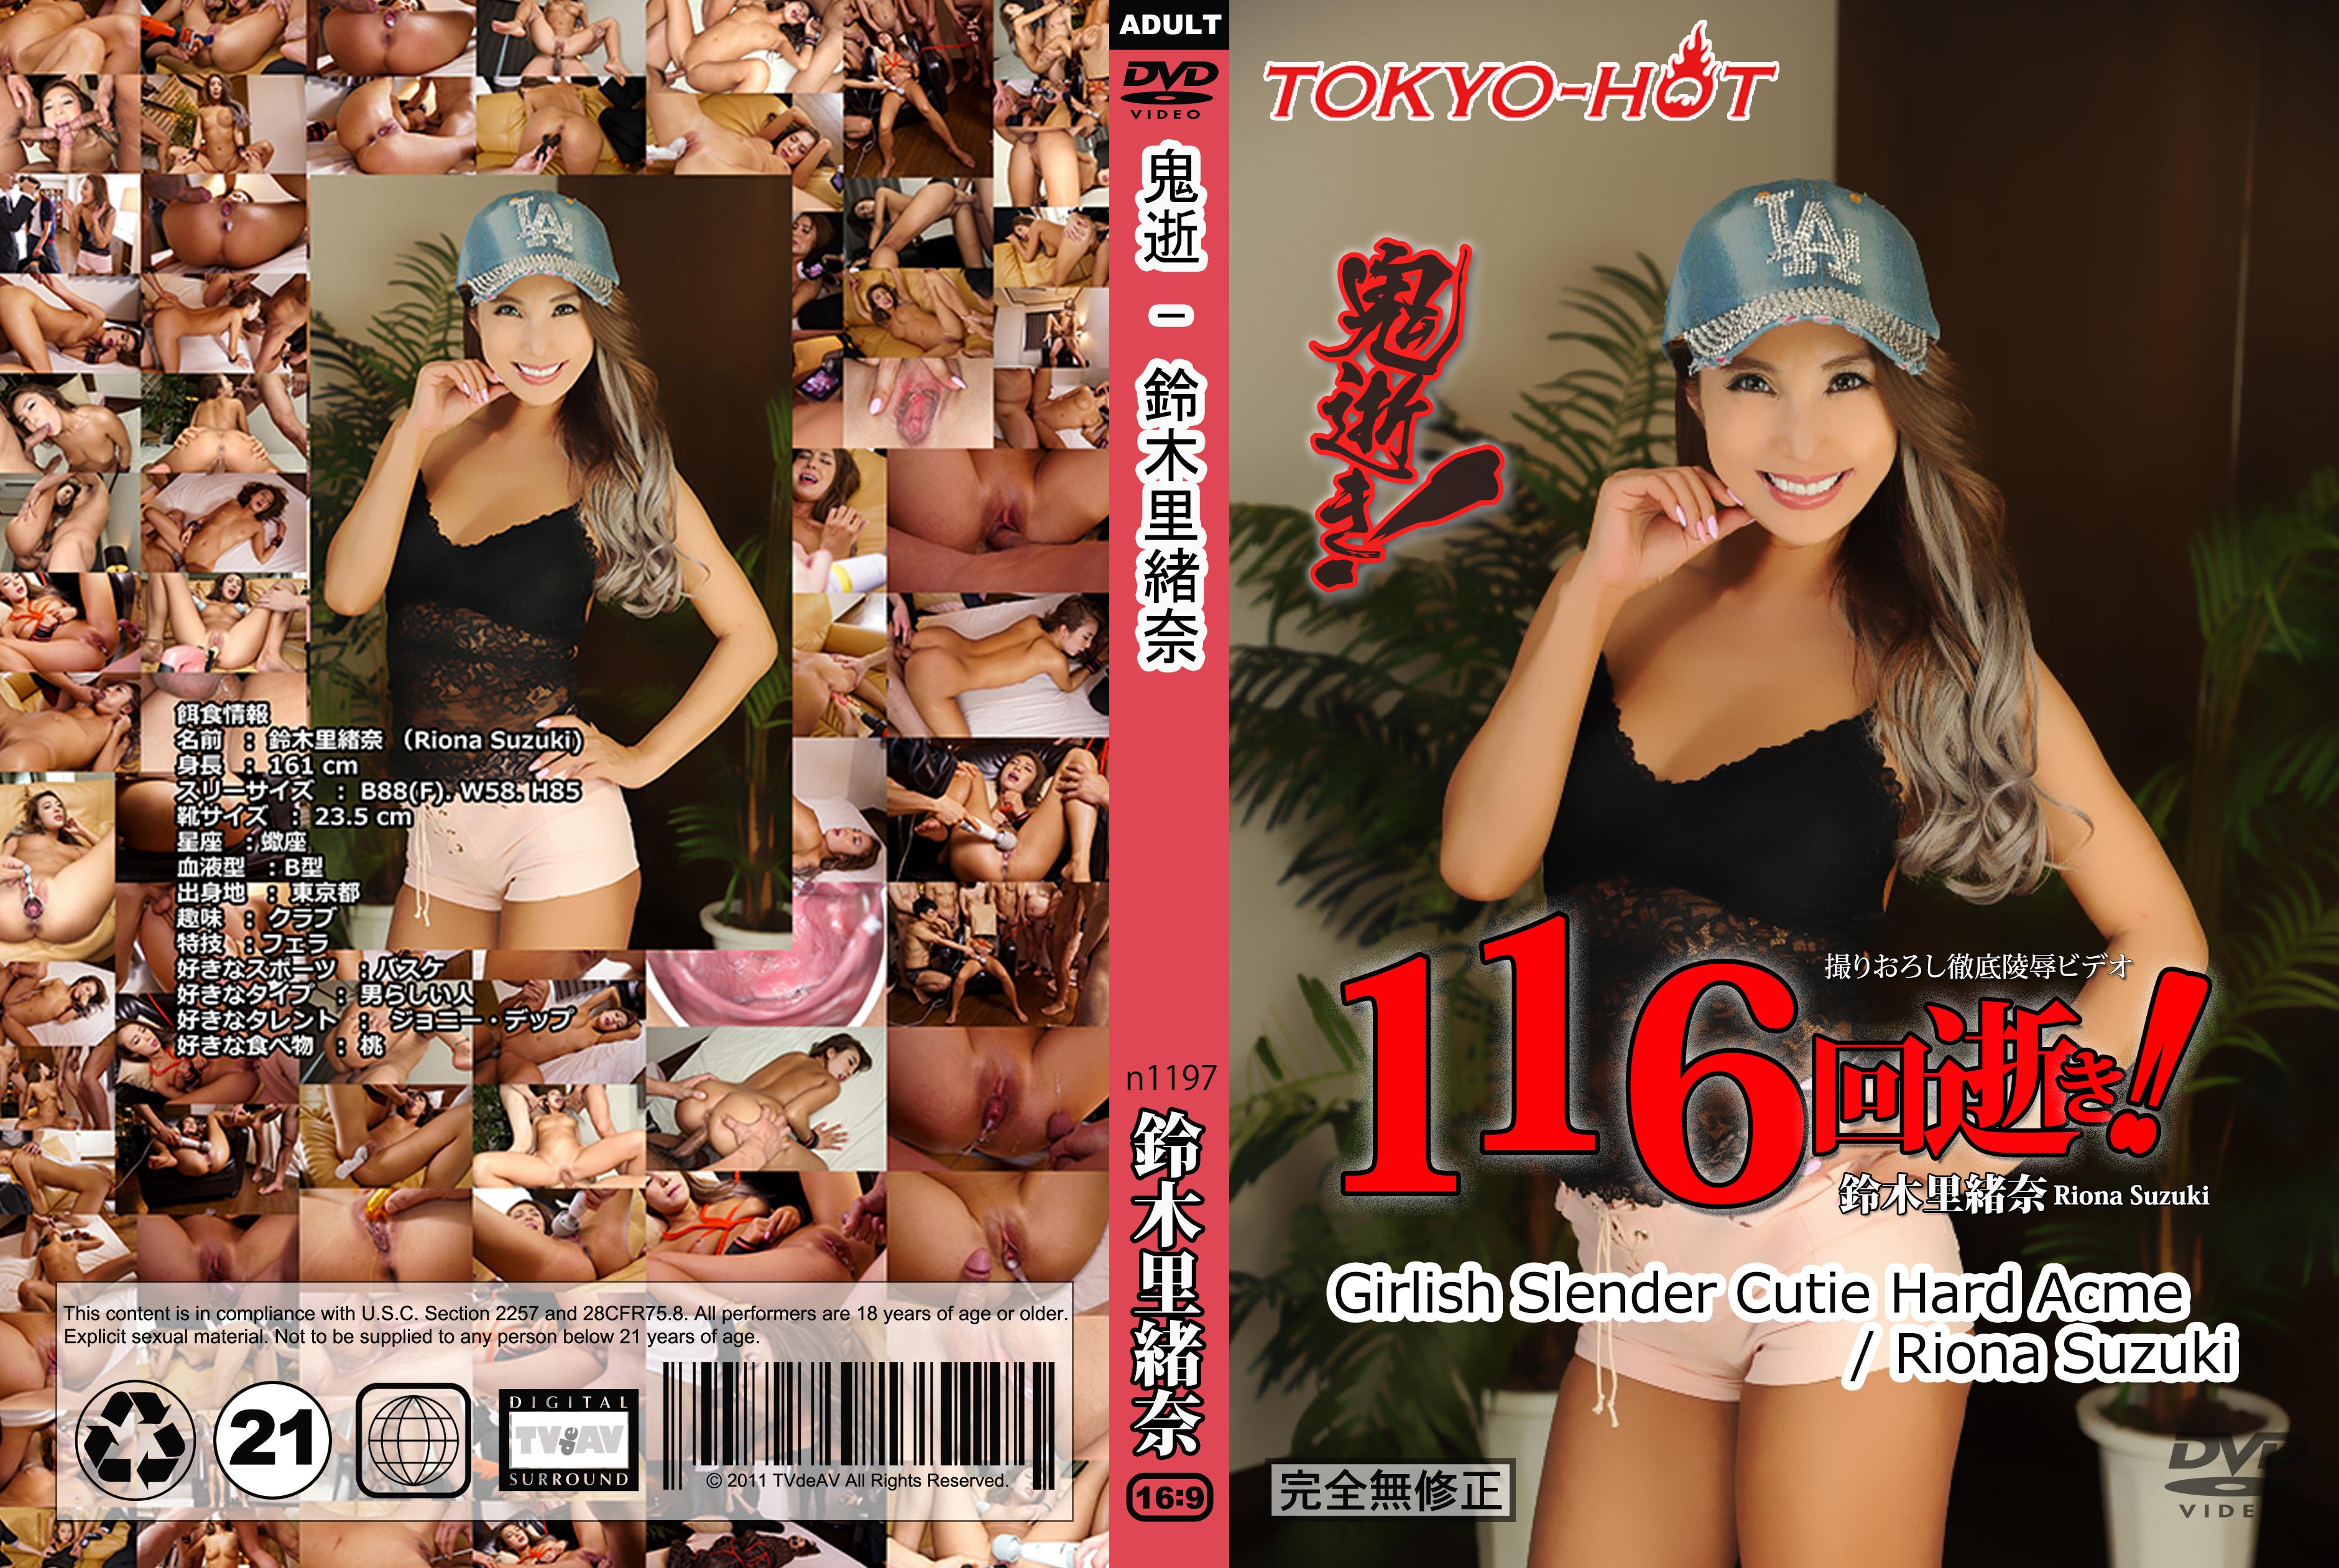 Tokyo Hot n1197 鬼逝~鈴木里緒奈